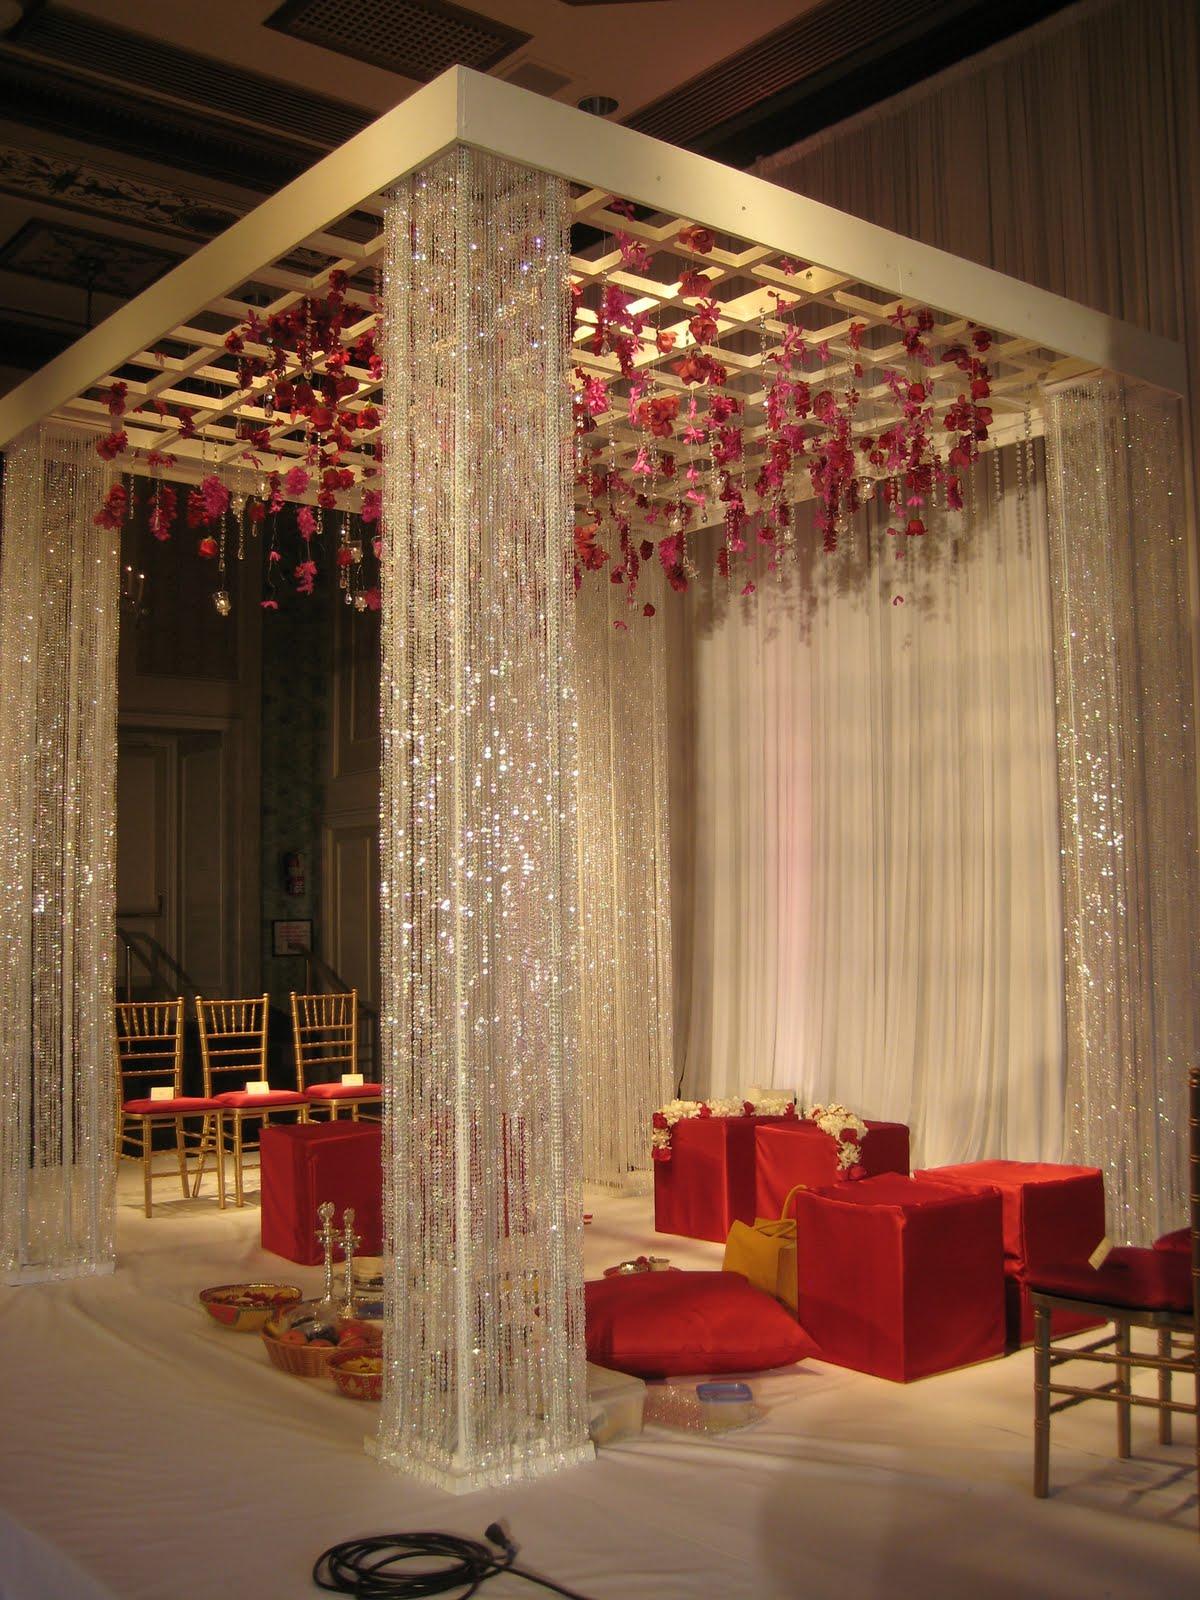 صور كوش افراح جميلة احلي كوشات اعراس (6)